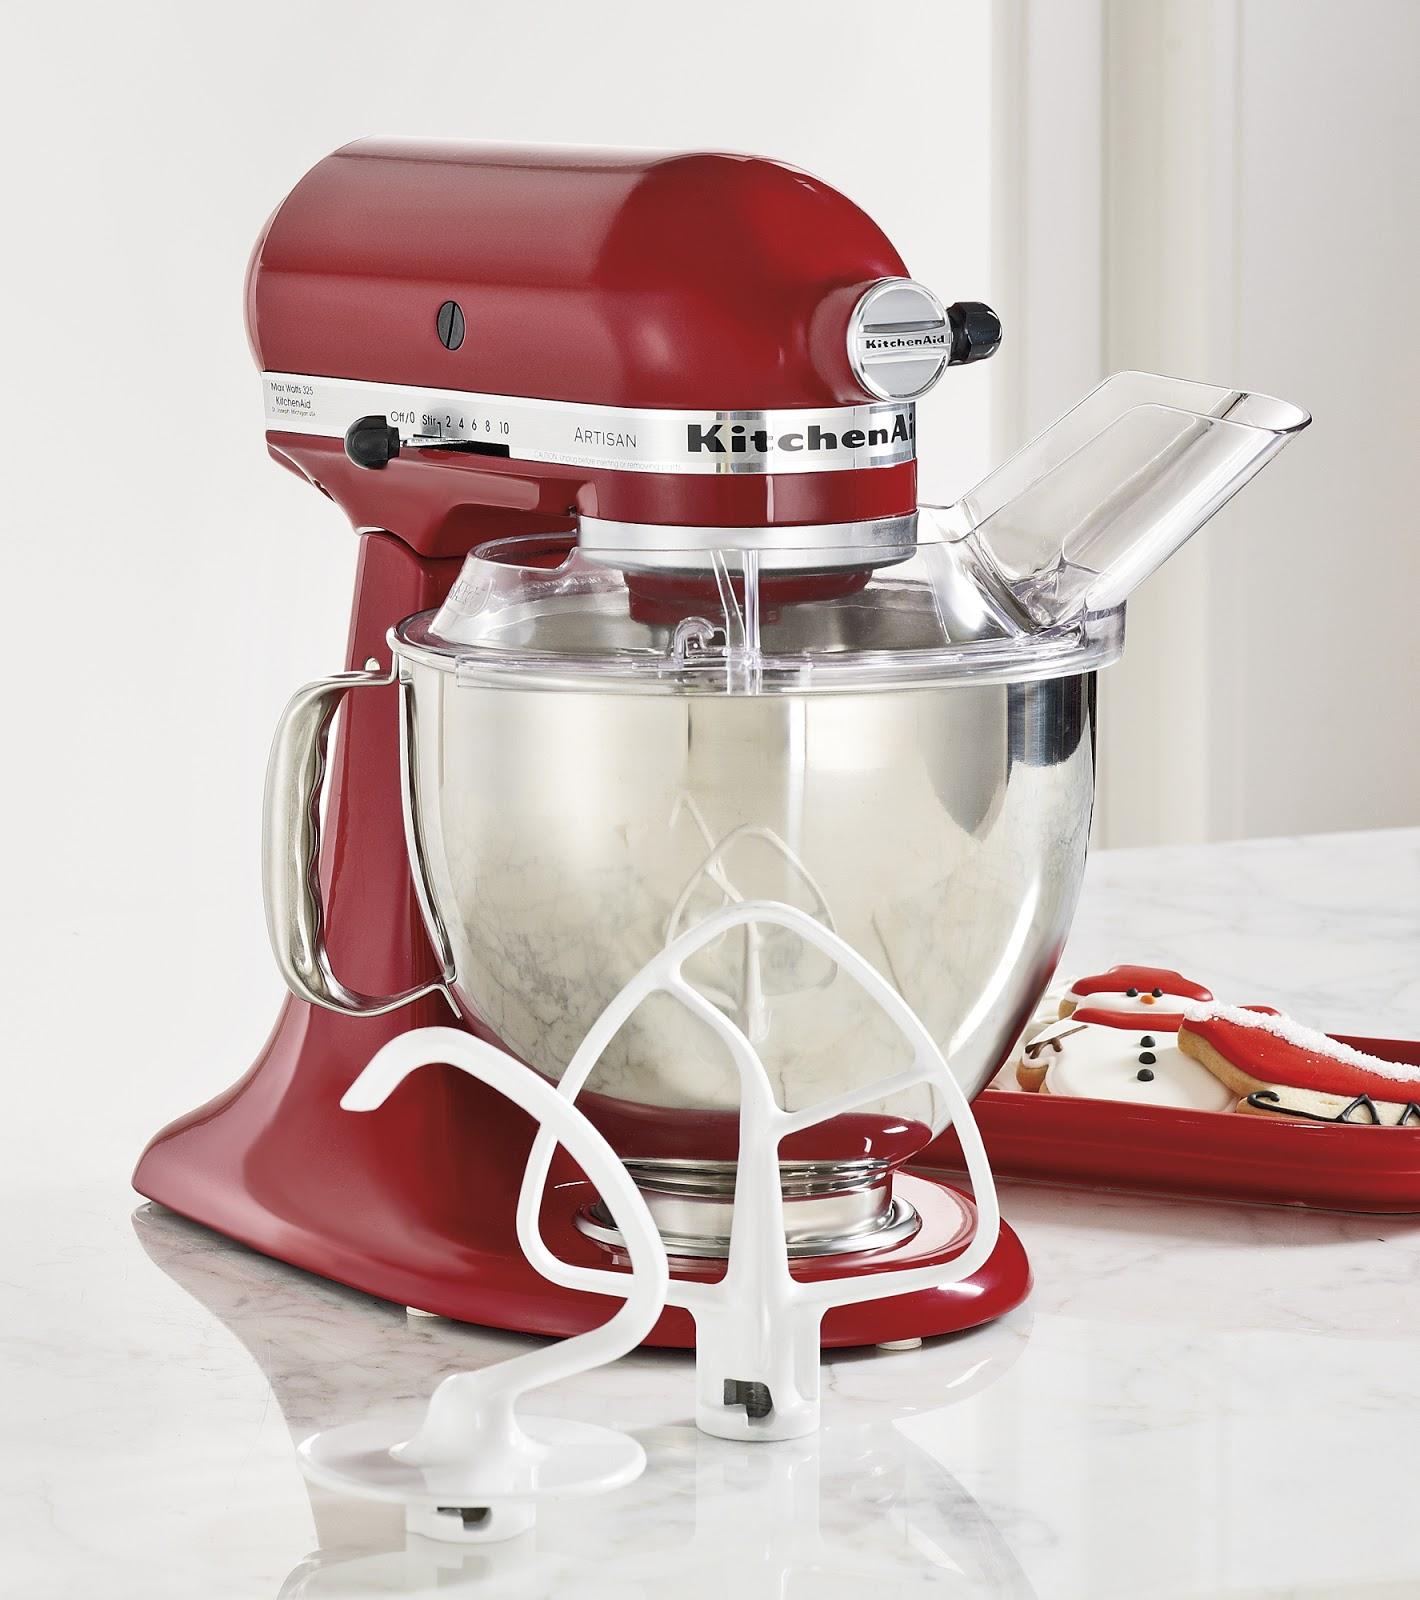 Kitchen stand mixer Photo - 12